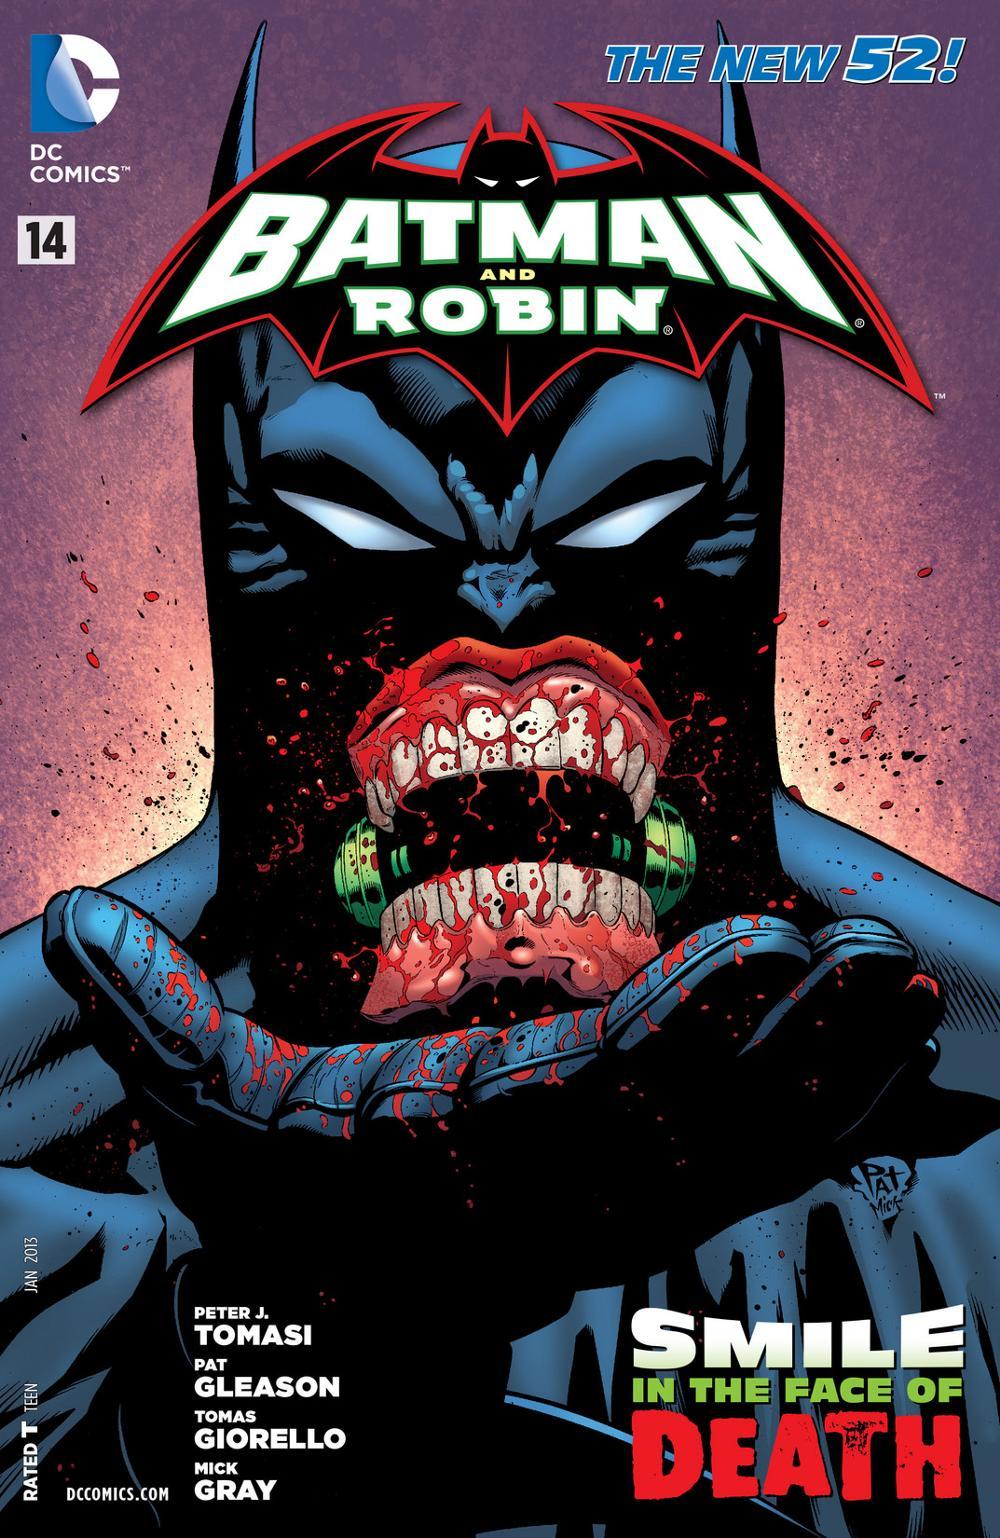 Batman & Robin 14 - Batman and Robin - Smile in the Face of Death